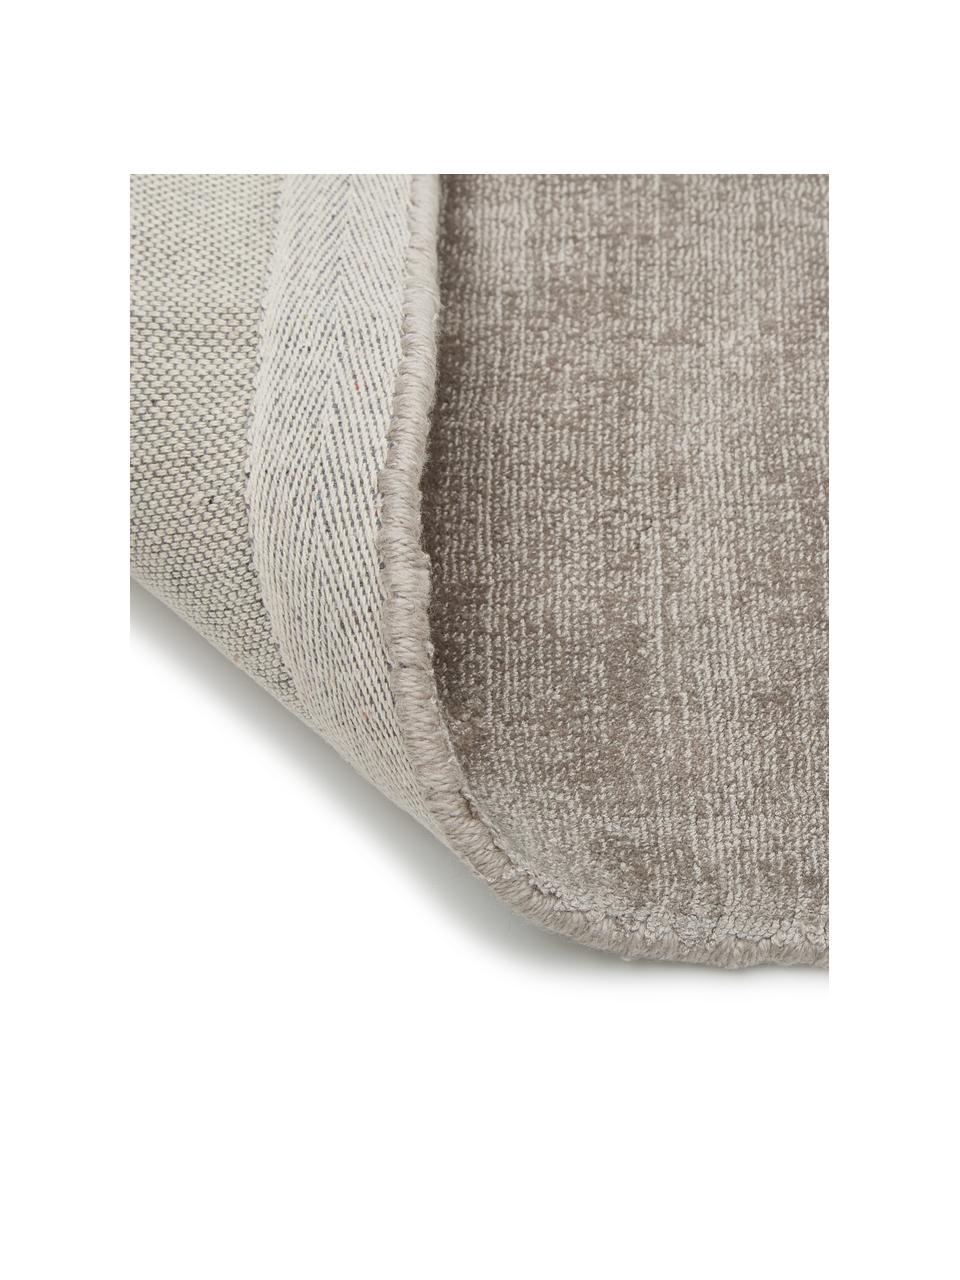 Passatoia in viscosa tessuta a mano Jane, Retro: 100% cotone, Taupe, Larg. 80 x Lung. 250 cm